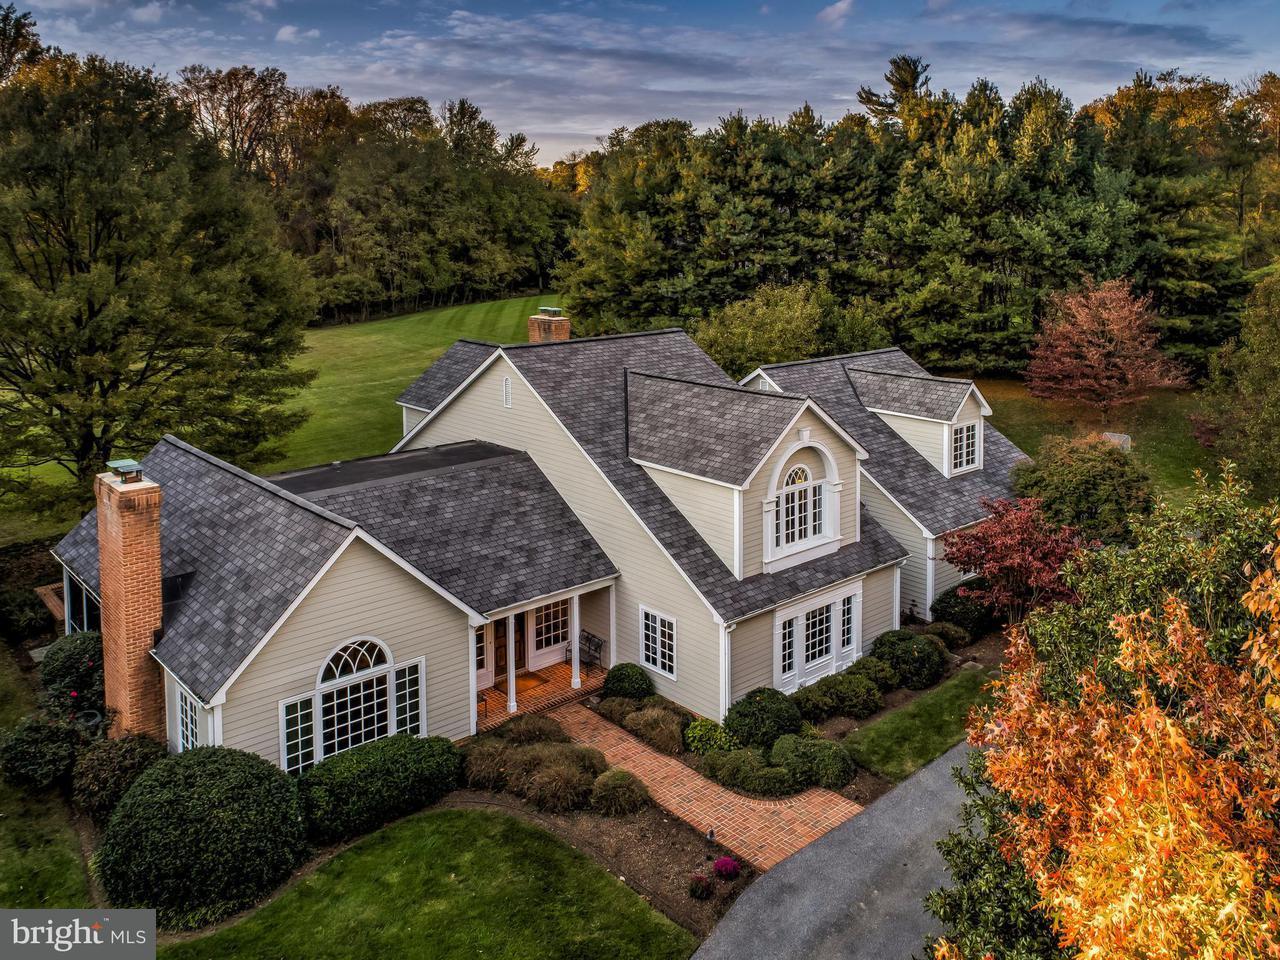 独户住宅 为 销售 在 522 Greenwood Road 522 Greenwood Road 陶森市, 马里兰州 21204 美国